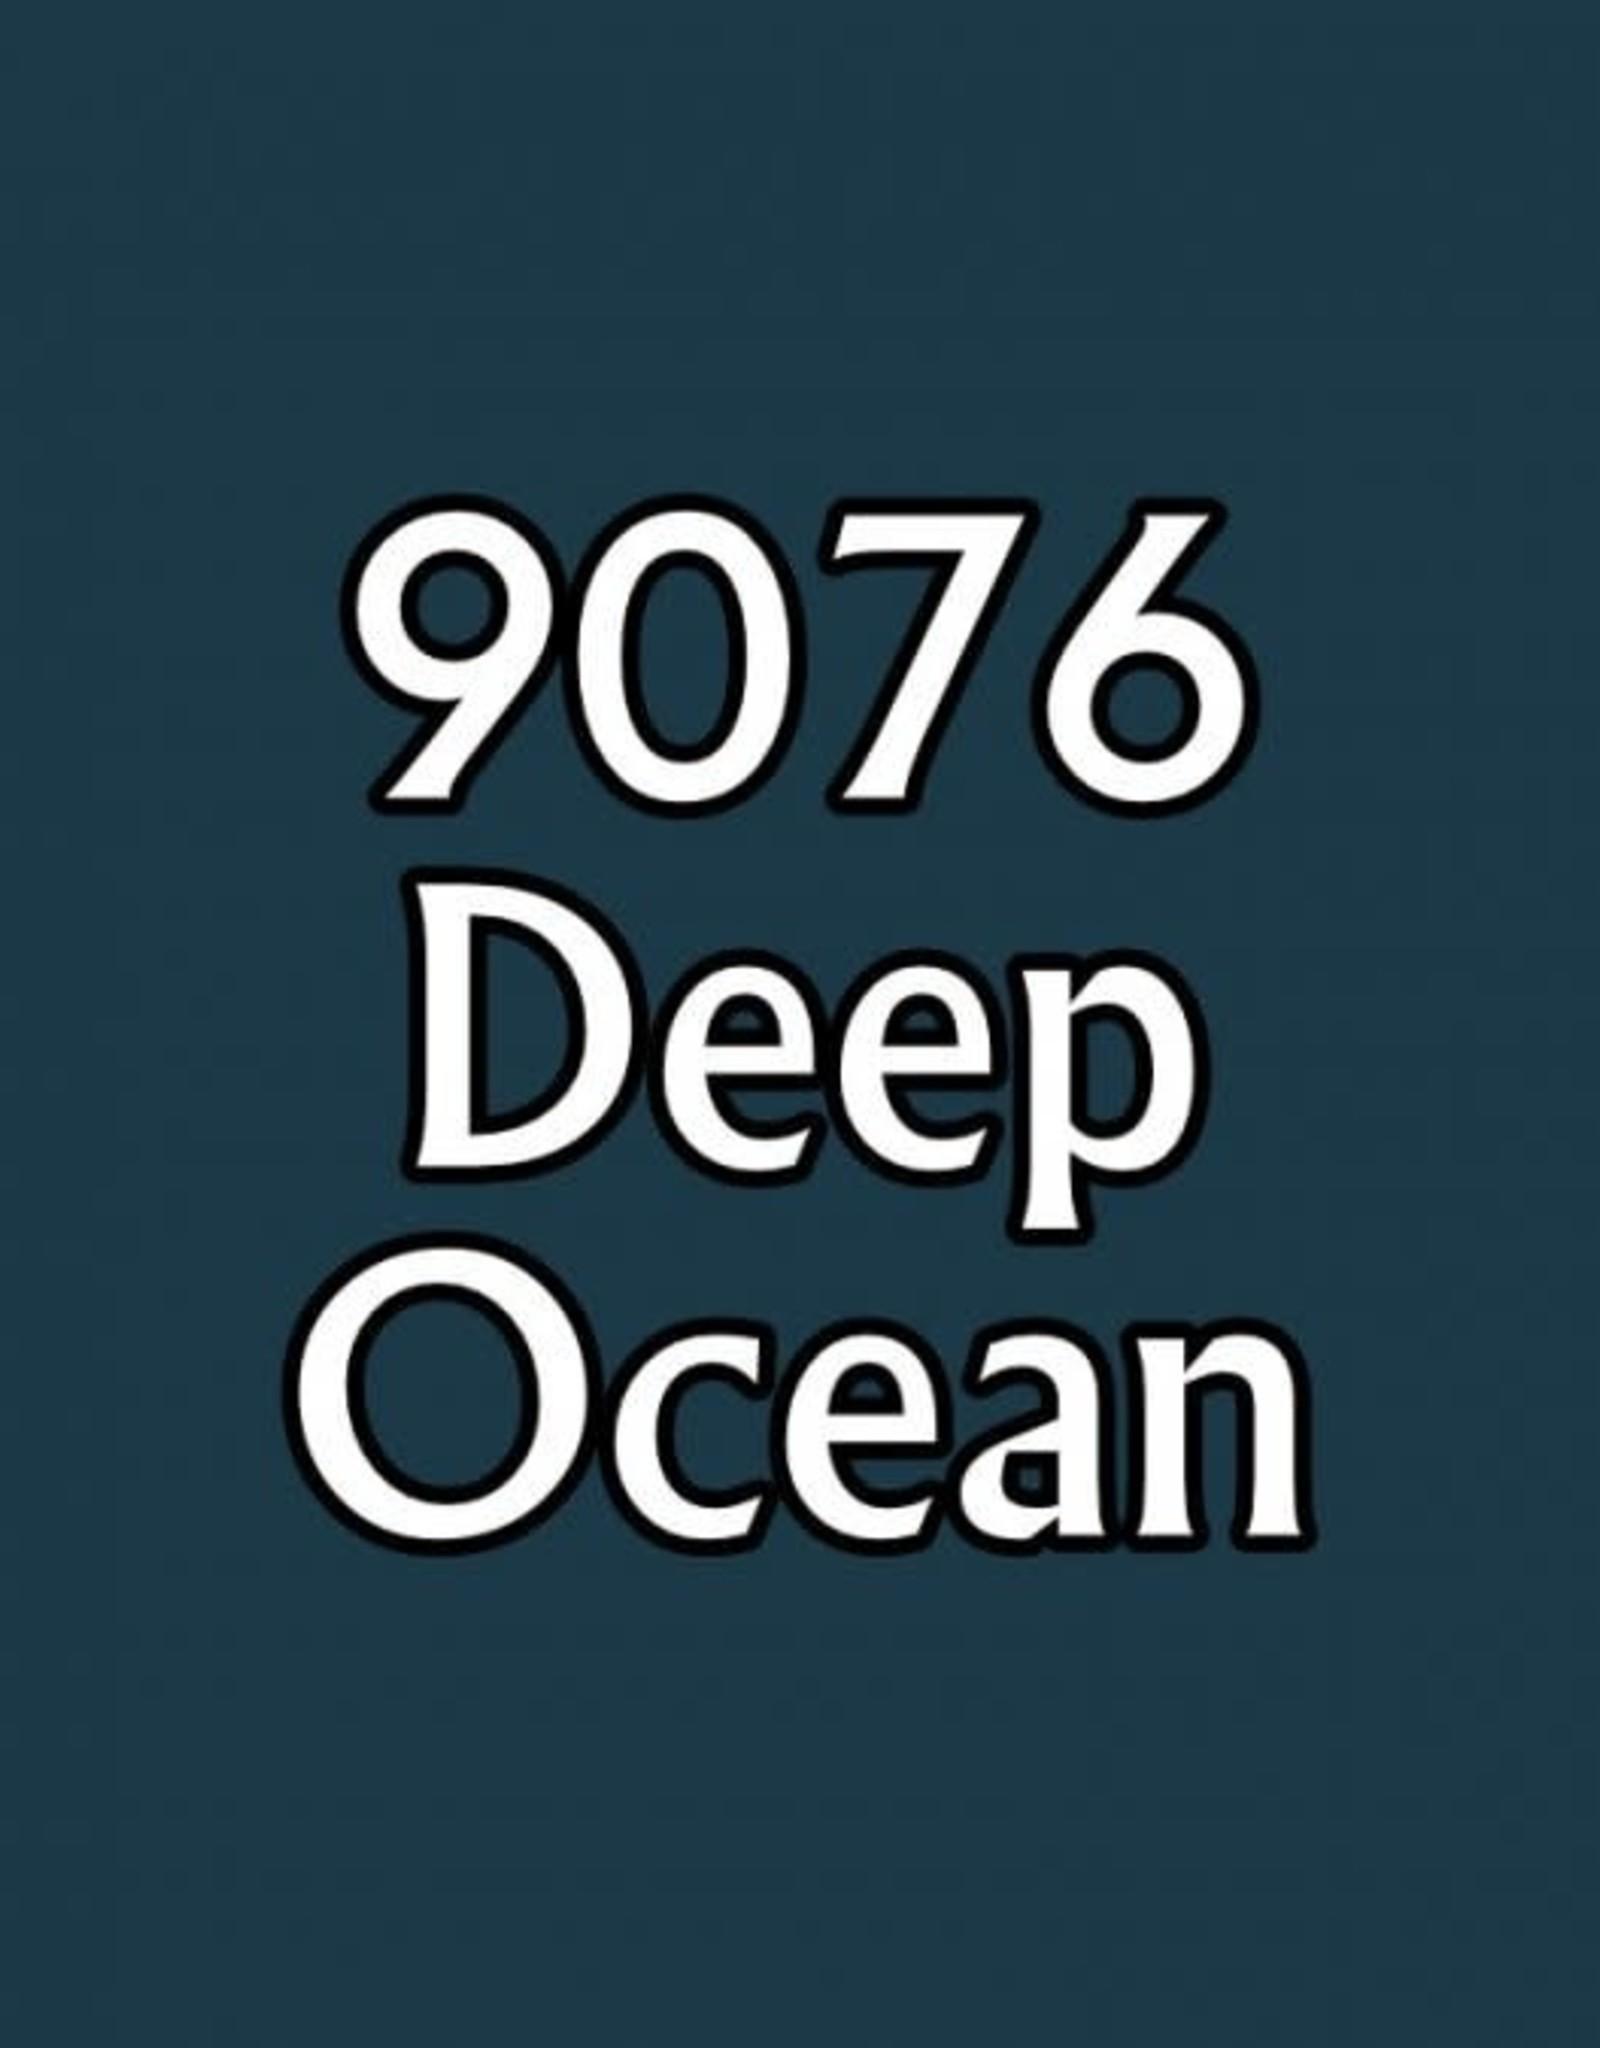 Reaper Deep Ocean